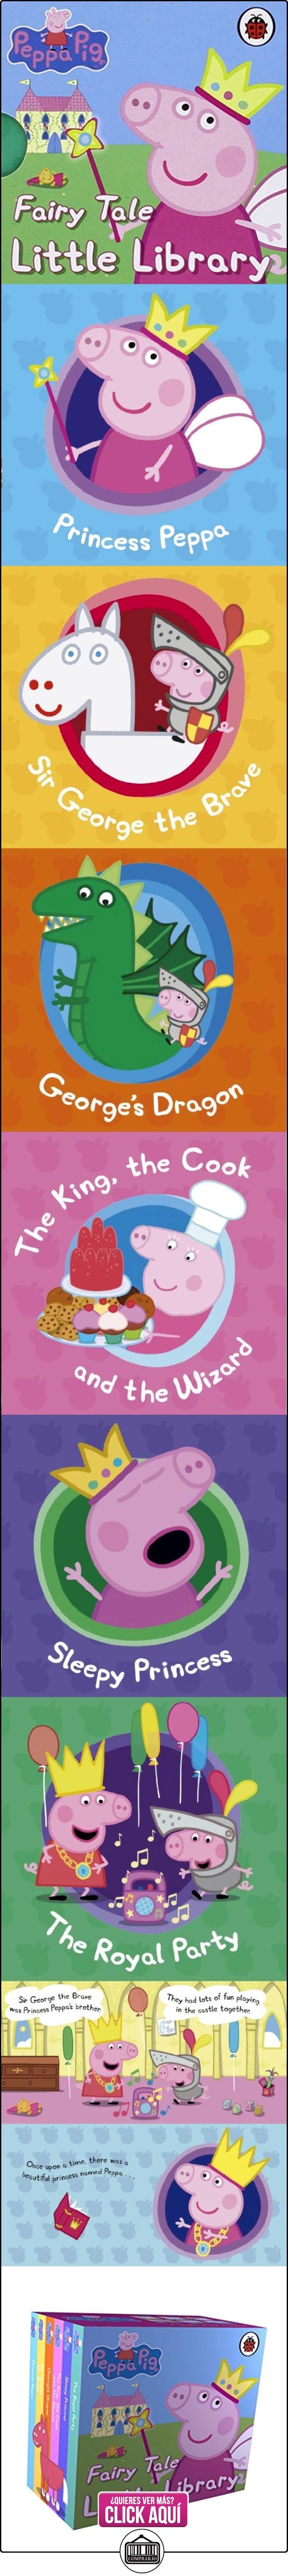 Peppa Pig: Fairy Tale Little Library Lauren Holowaty ✿ Peppa Pig - Peppa La Cerdita ✿ ▬► Ver oferta: http://comprar.io/goto/1409306178